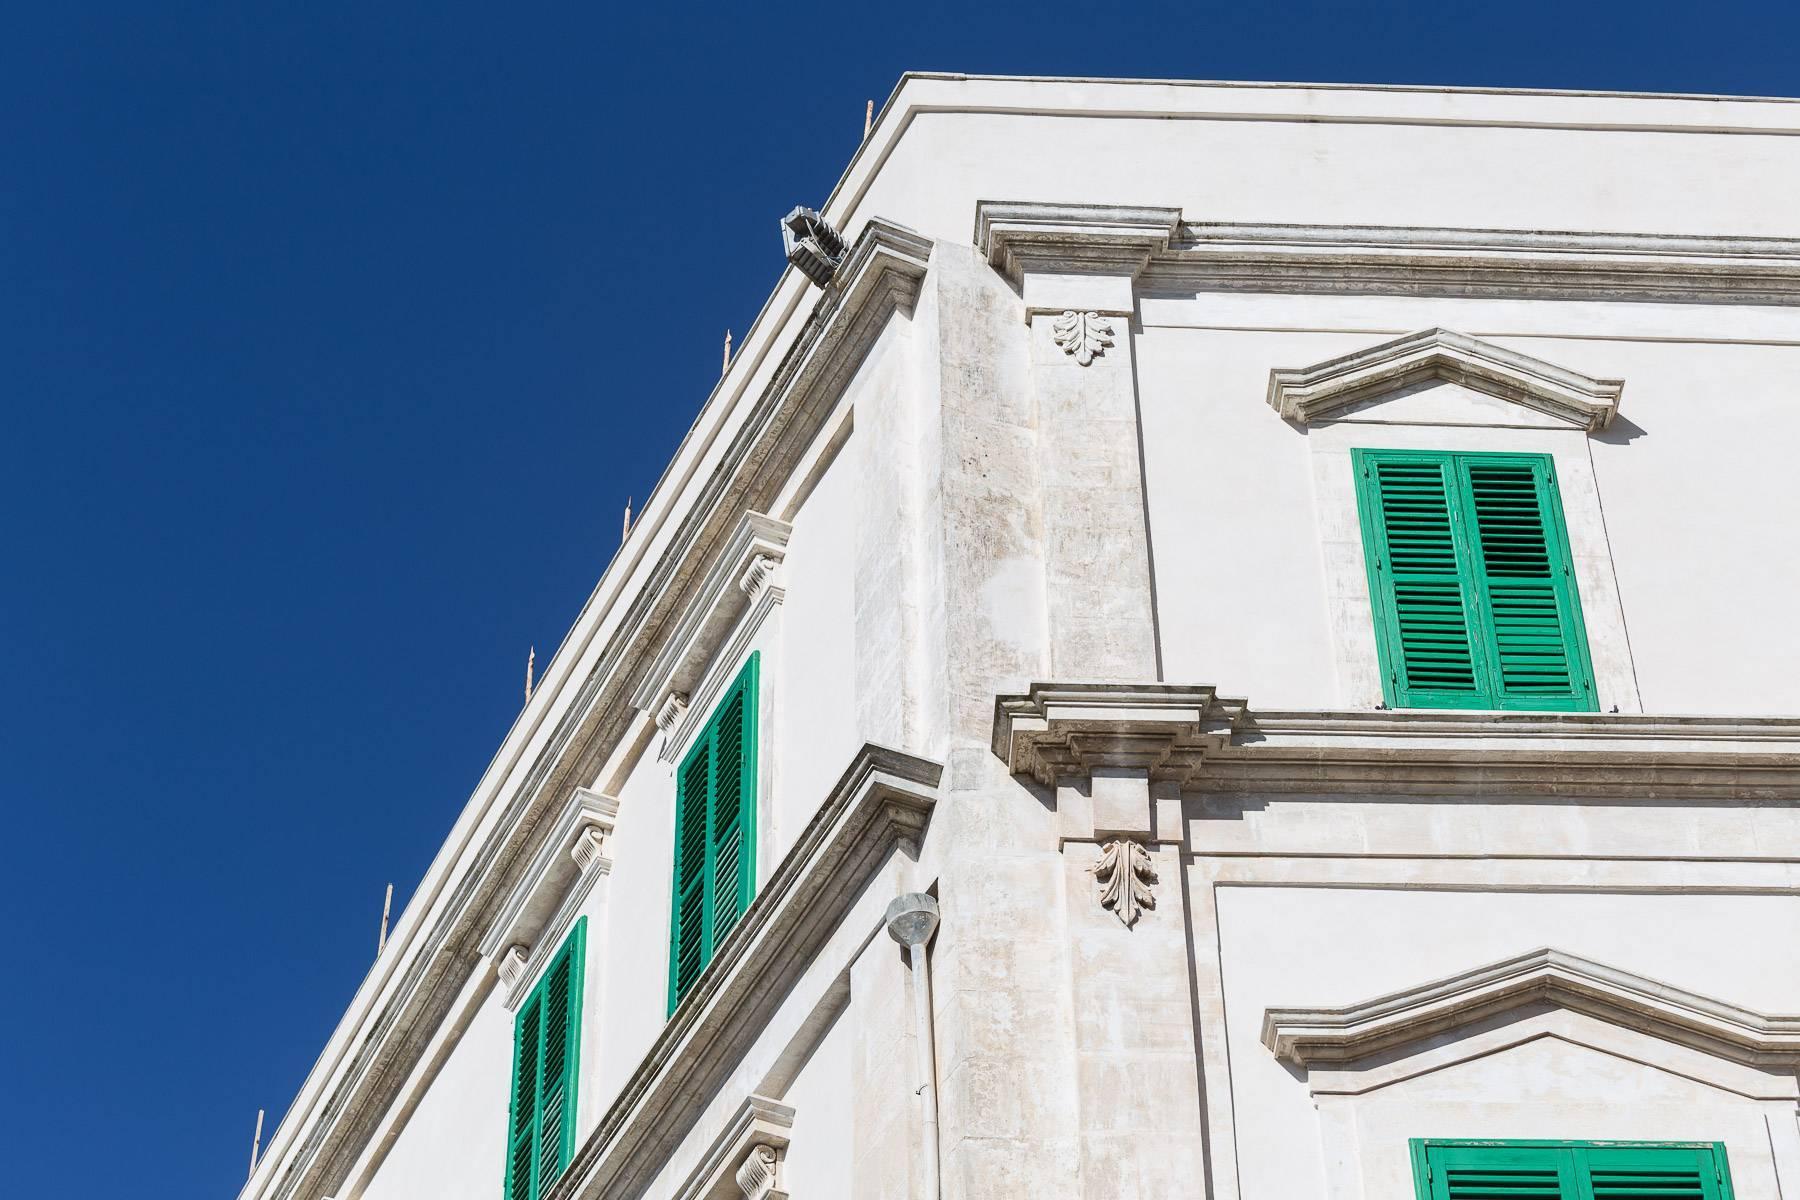 Palazzo storico a Modica - 2